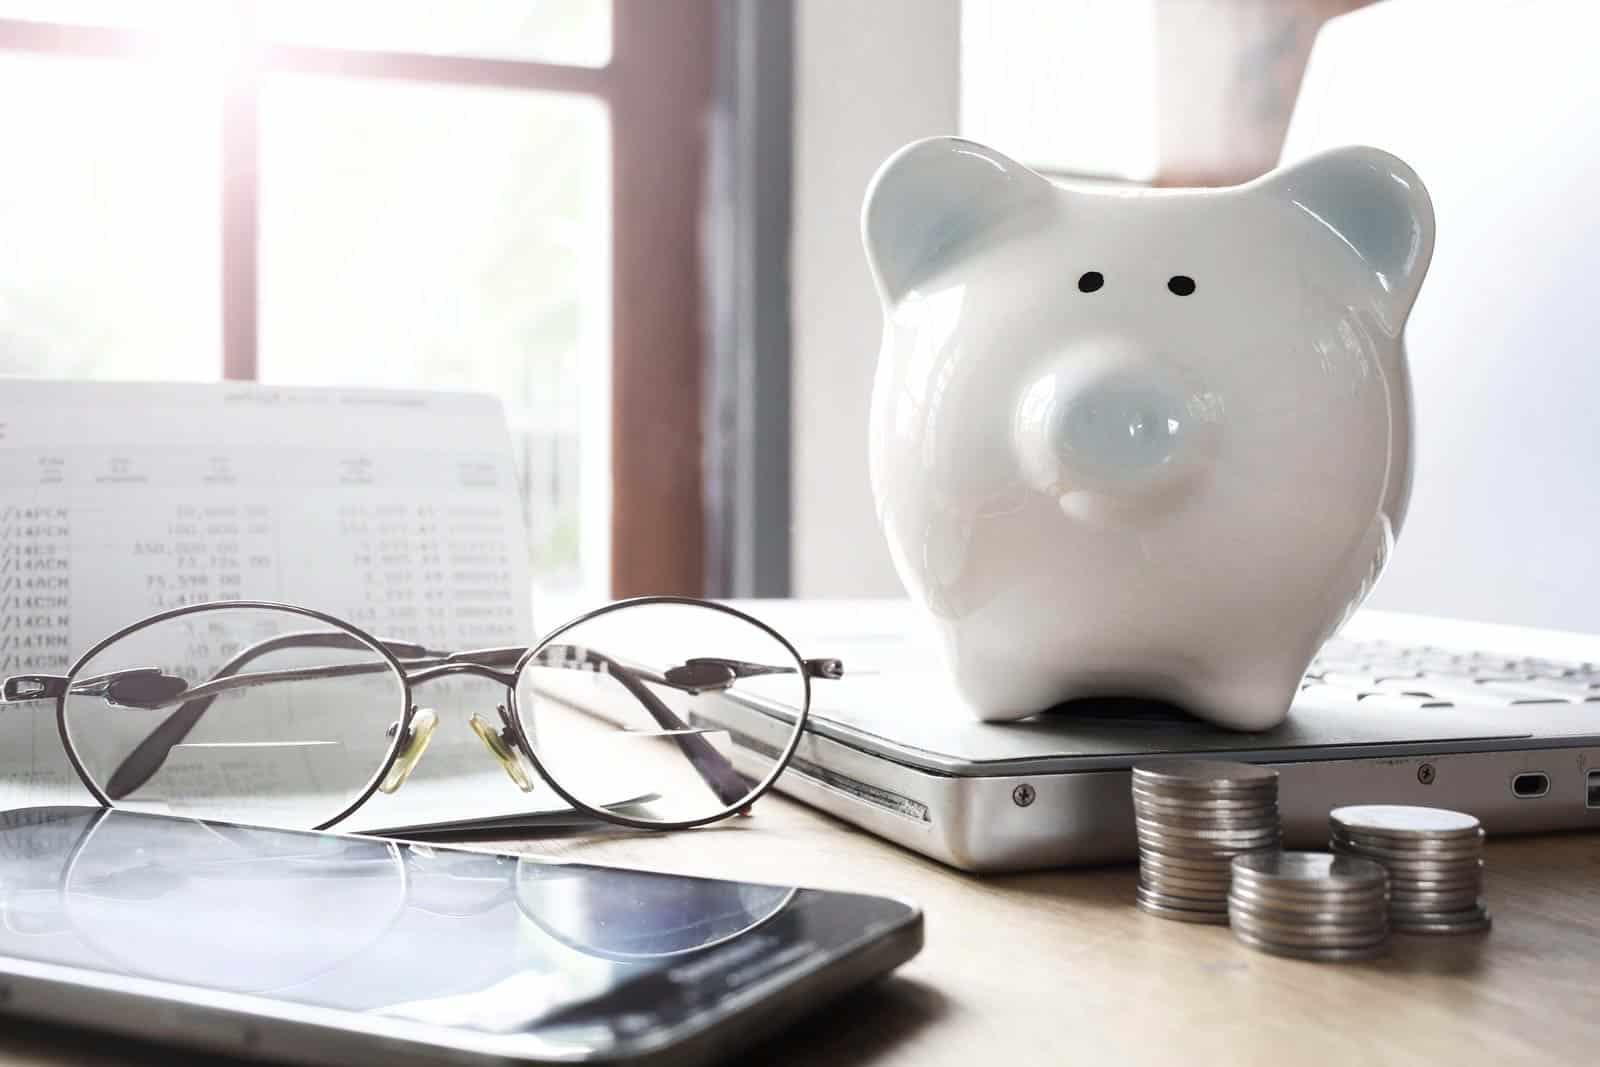 Kupi jamstvo za kredit